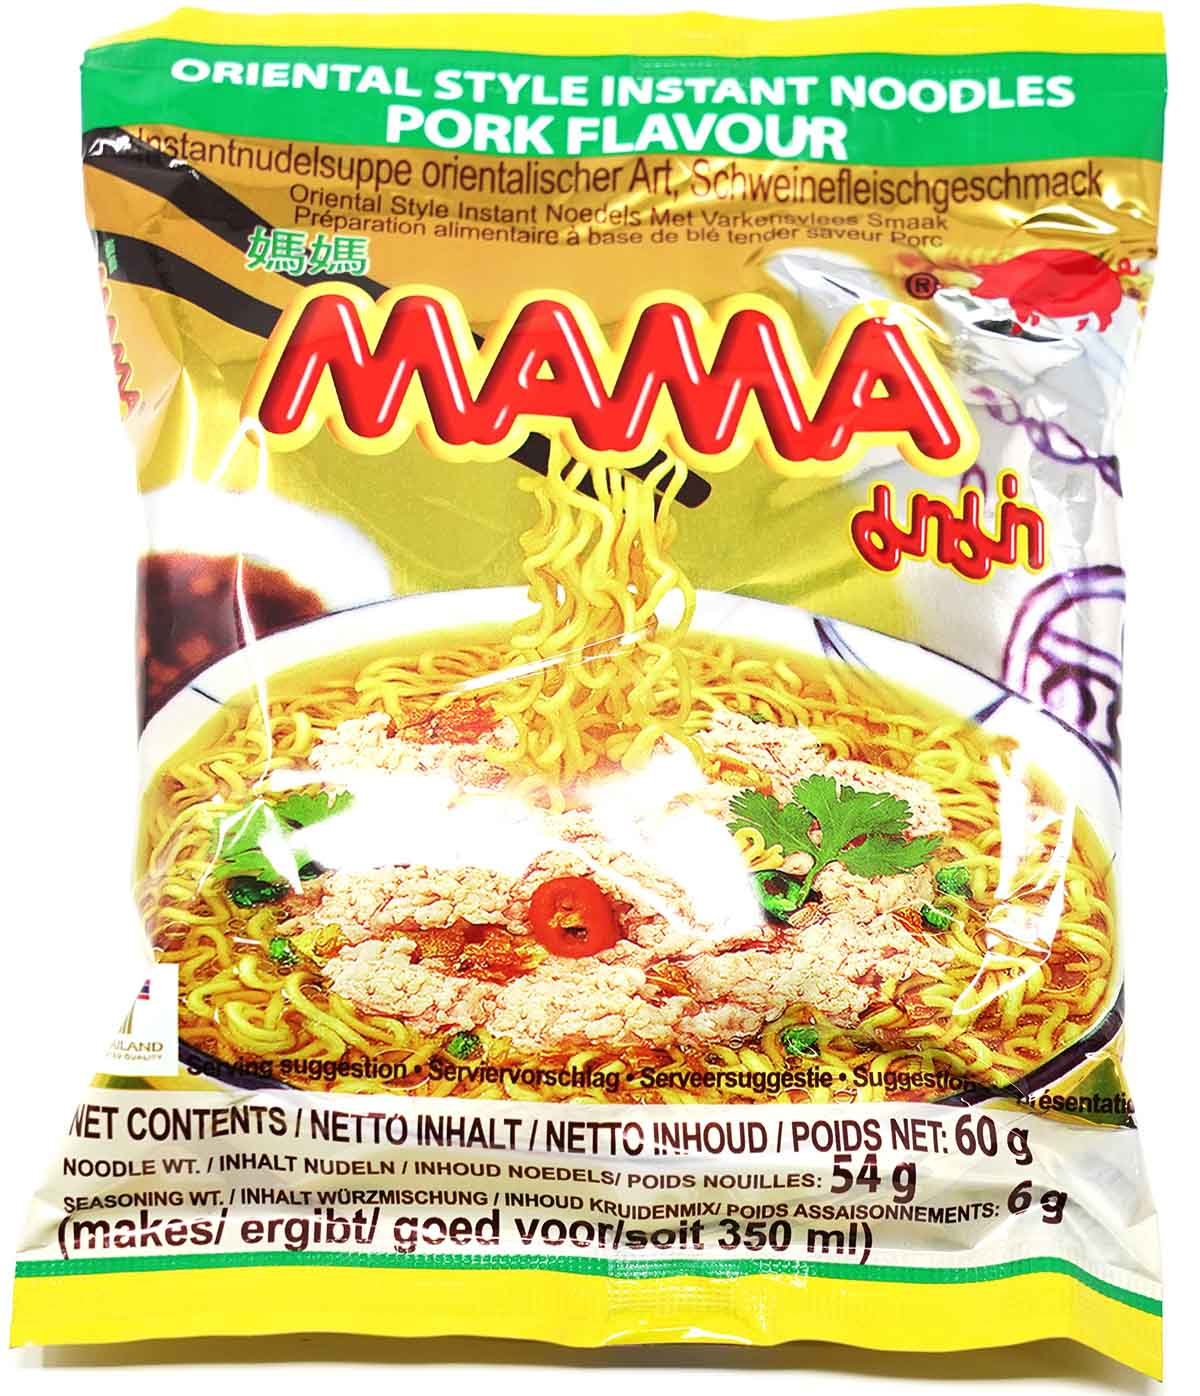 MAMA Instantnudeln Oriental Style Pork Flavour, 60 g